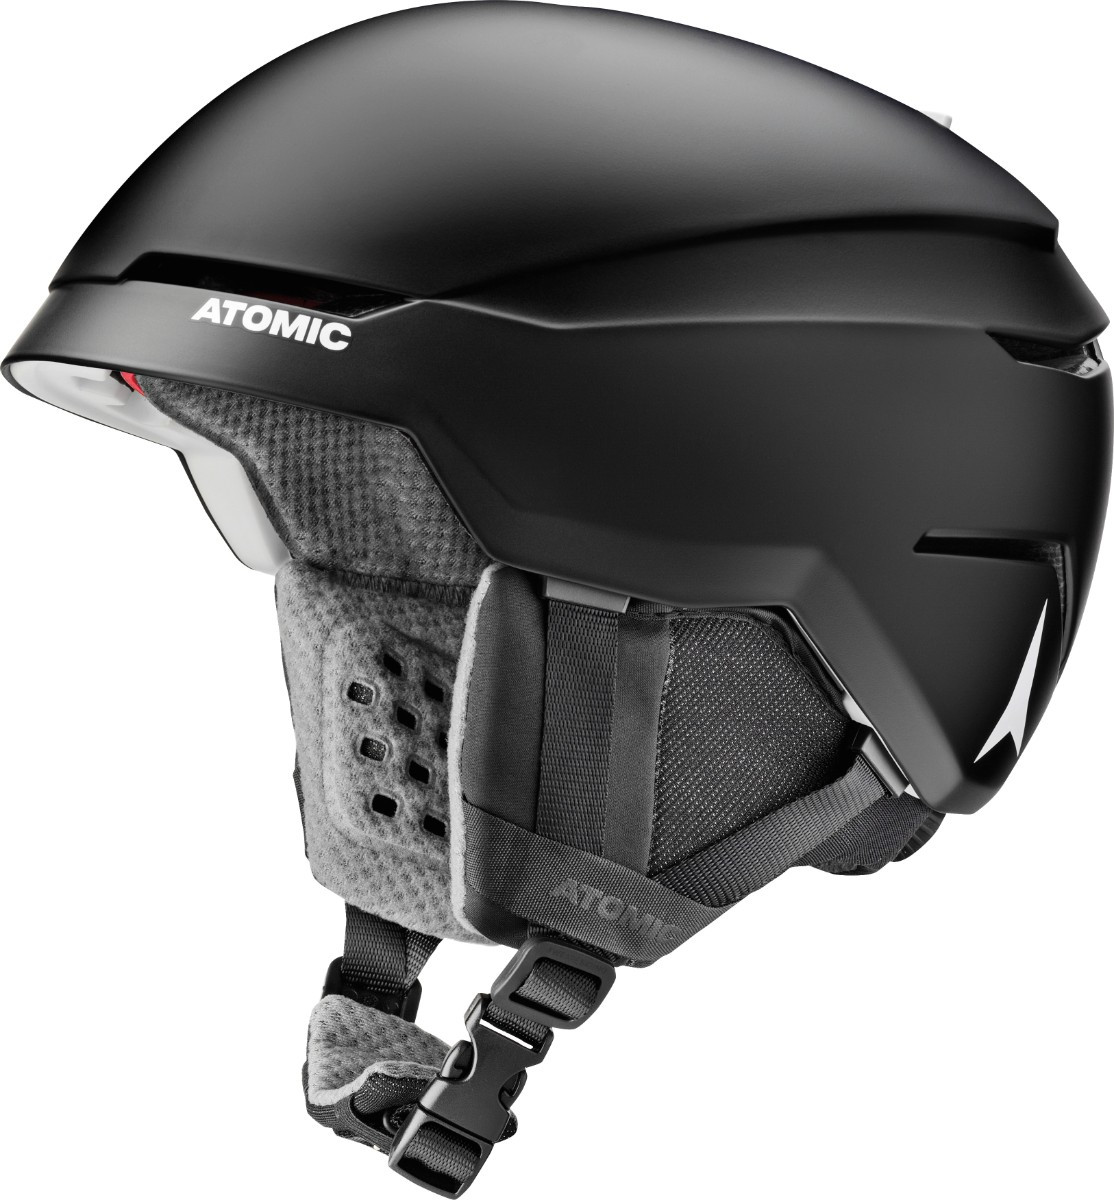 Atomic Savor - černá Velikost helmy: S 2019/2020